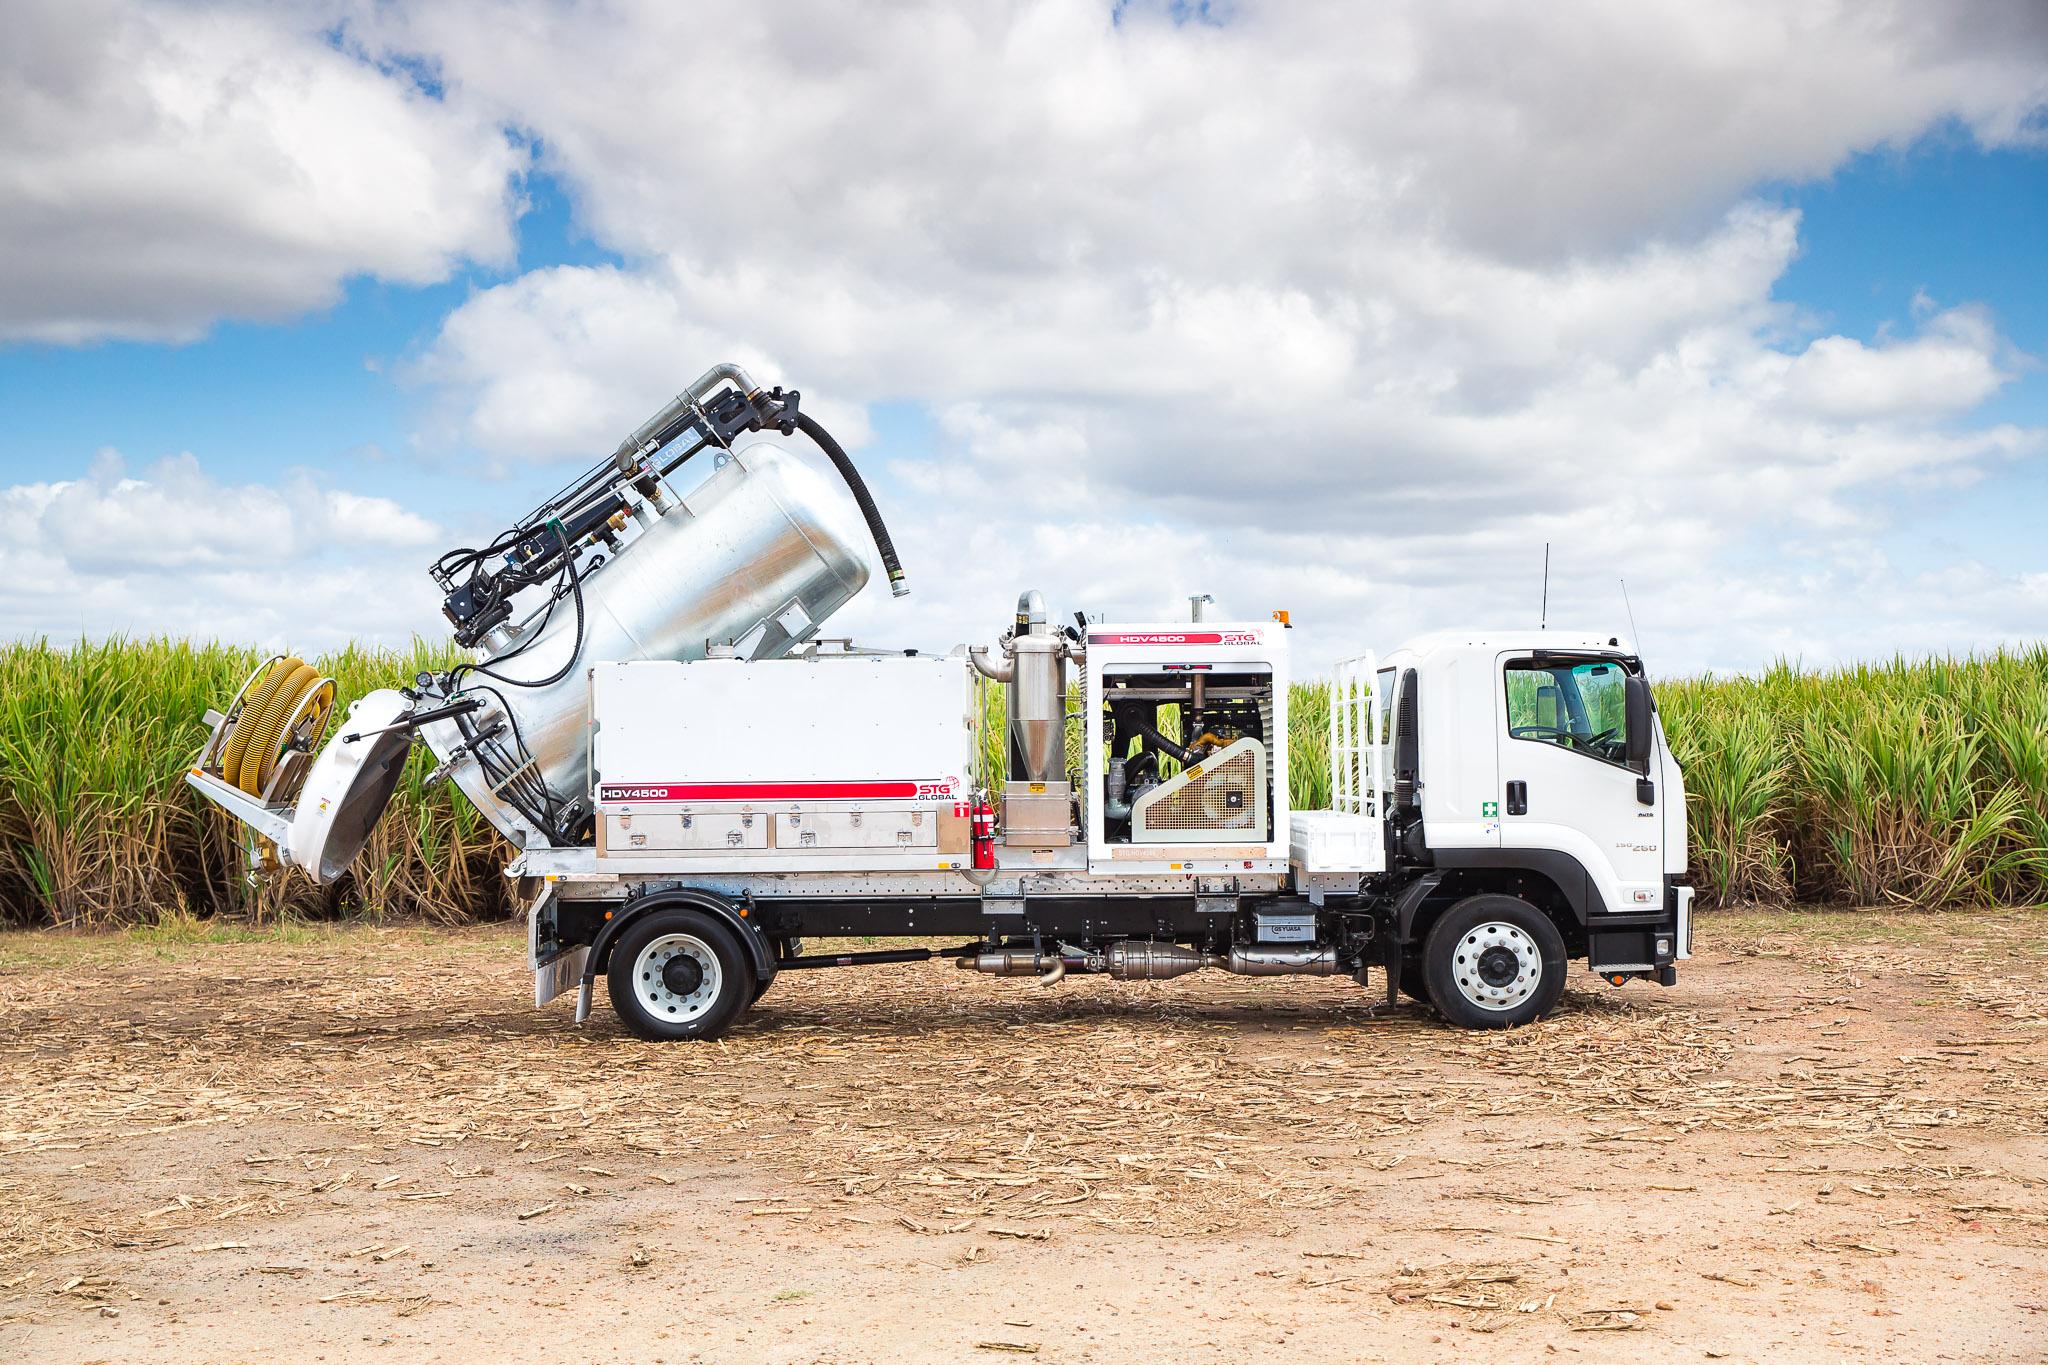 STG Global 2018 Isuzu FVD165-300 Auto 4x2 4,500Lt Vac Truck for sale